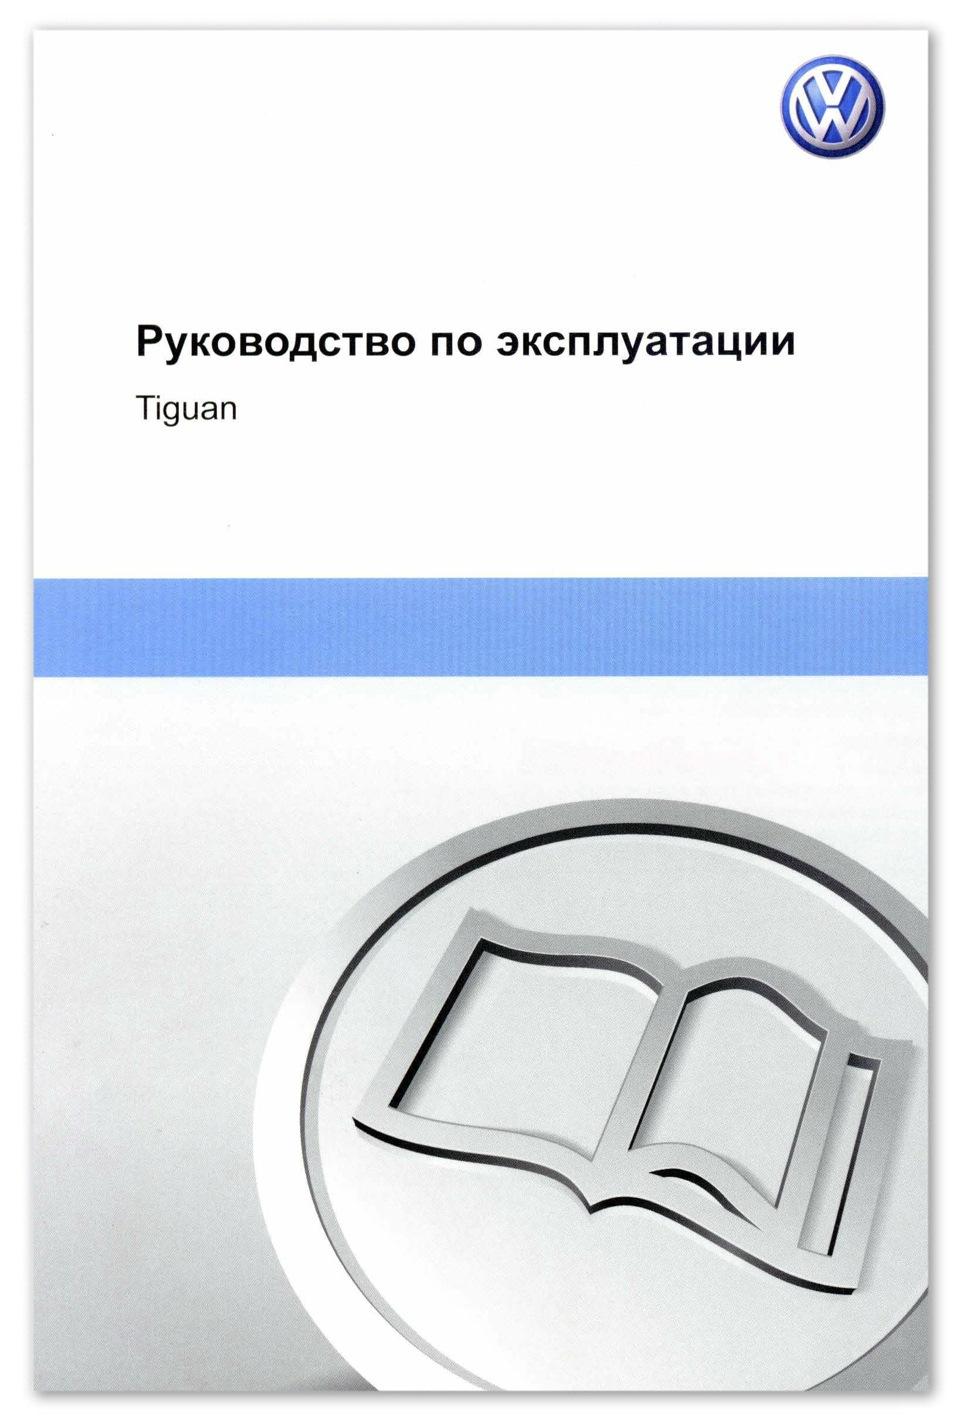 tiguan car manual filetype pdf